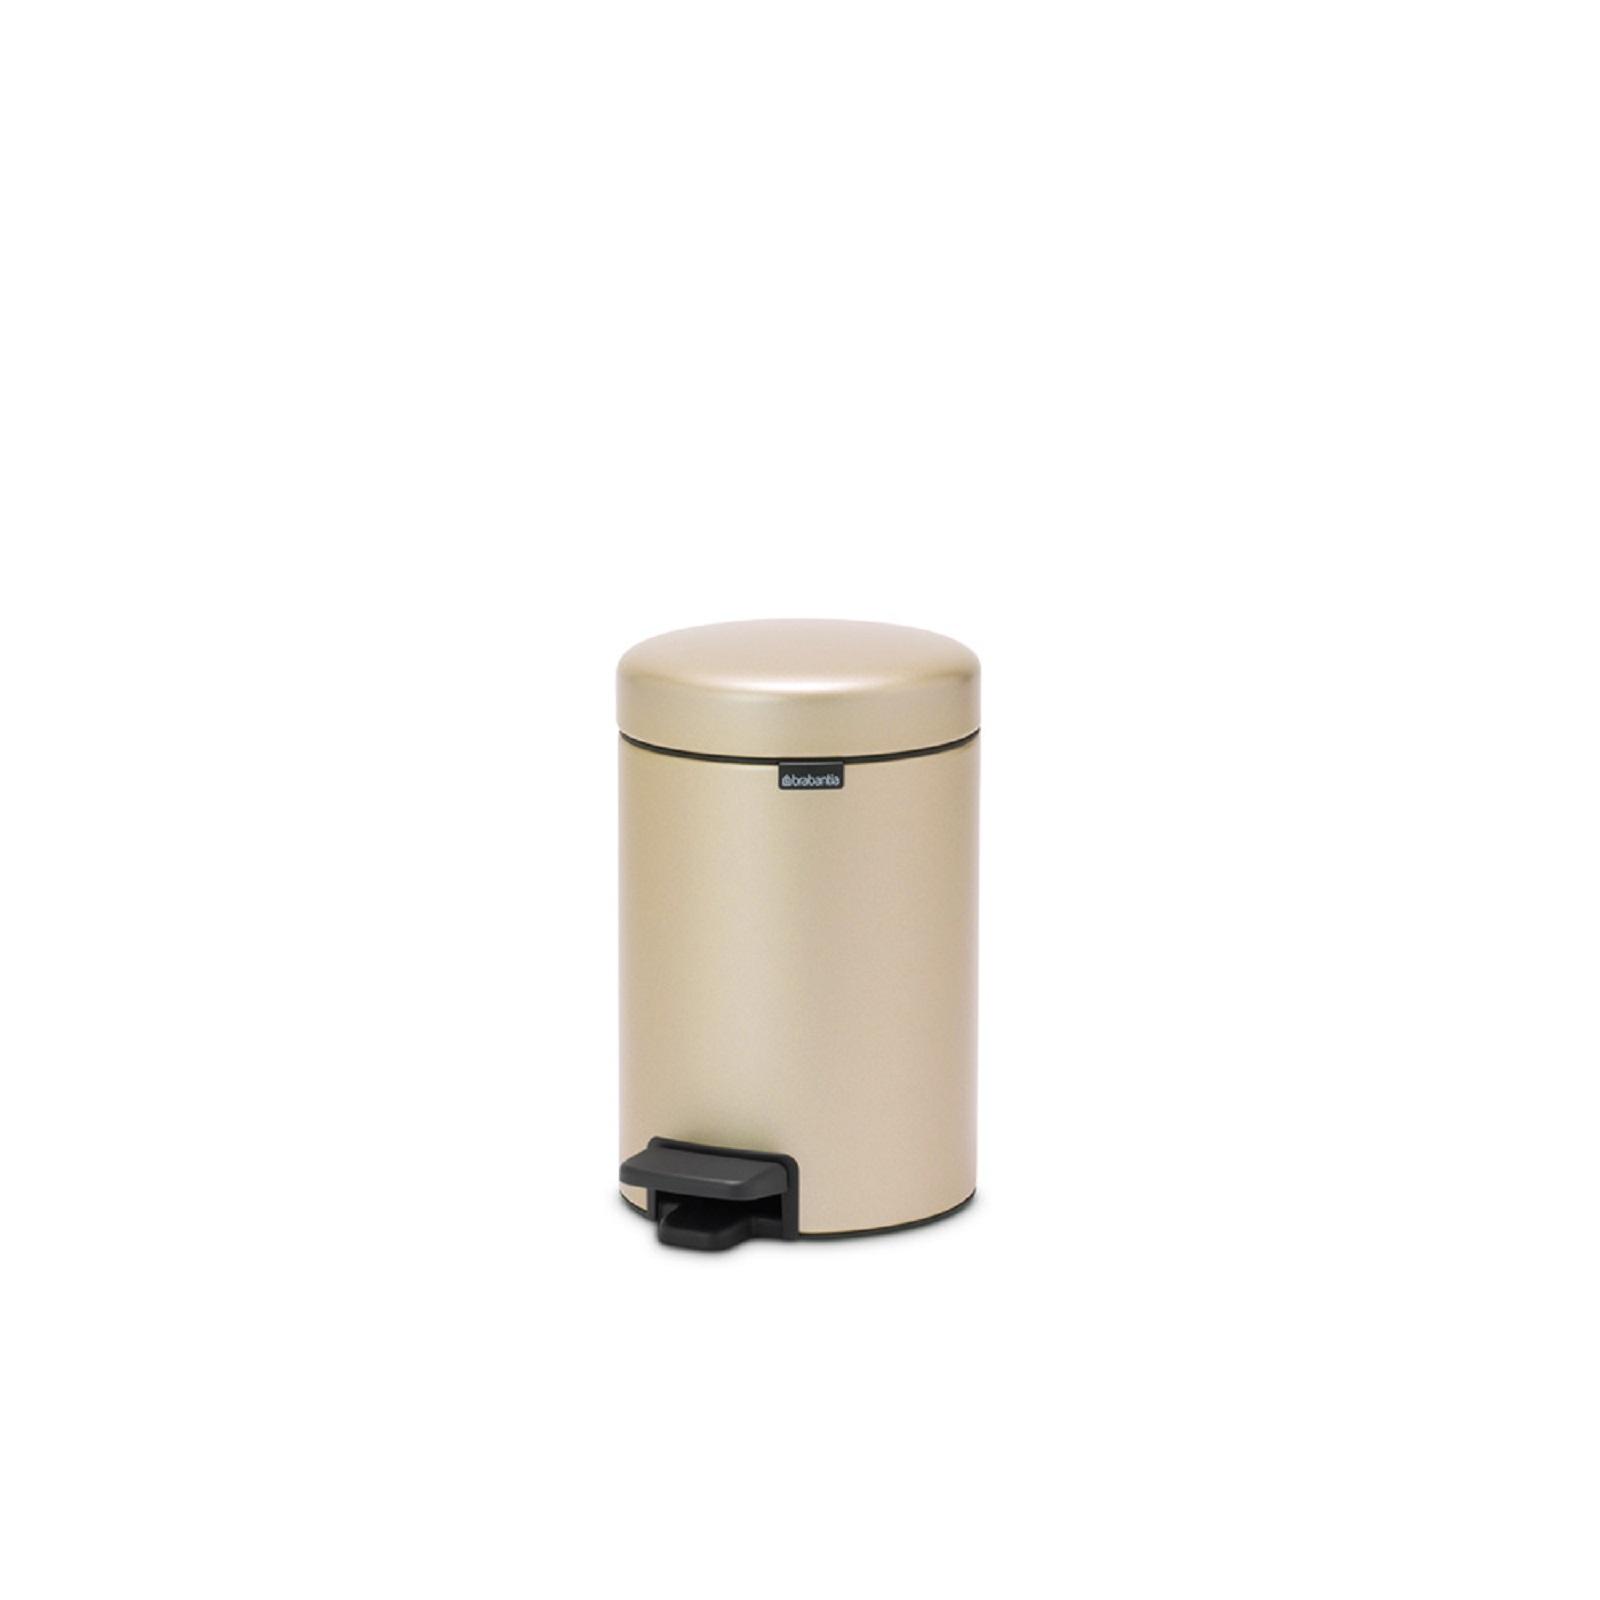 Бак для мусора Pedal Bin NewIcon Brabantia, объем 3 л, шампань бежевый Brabantia 304408 фото 2